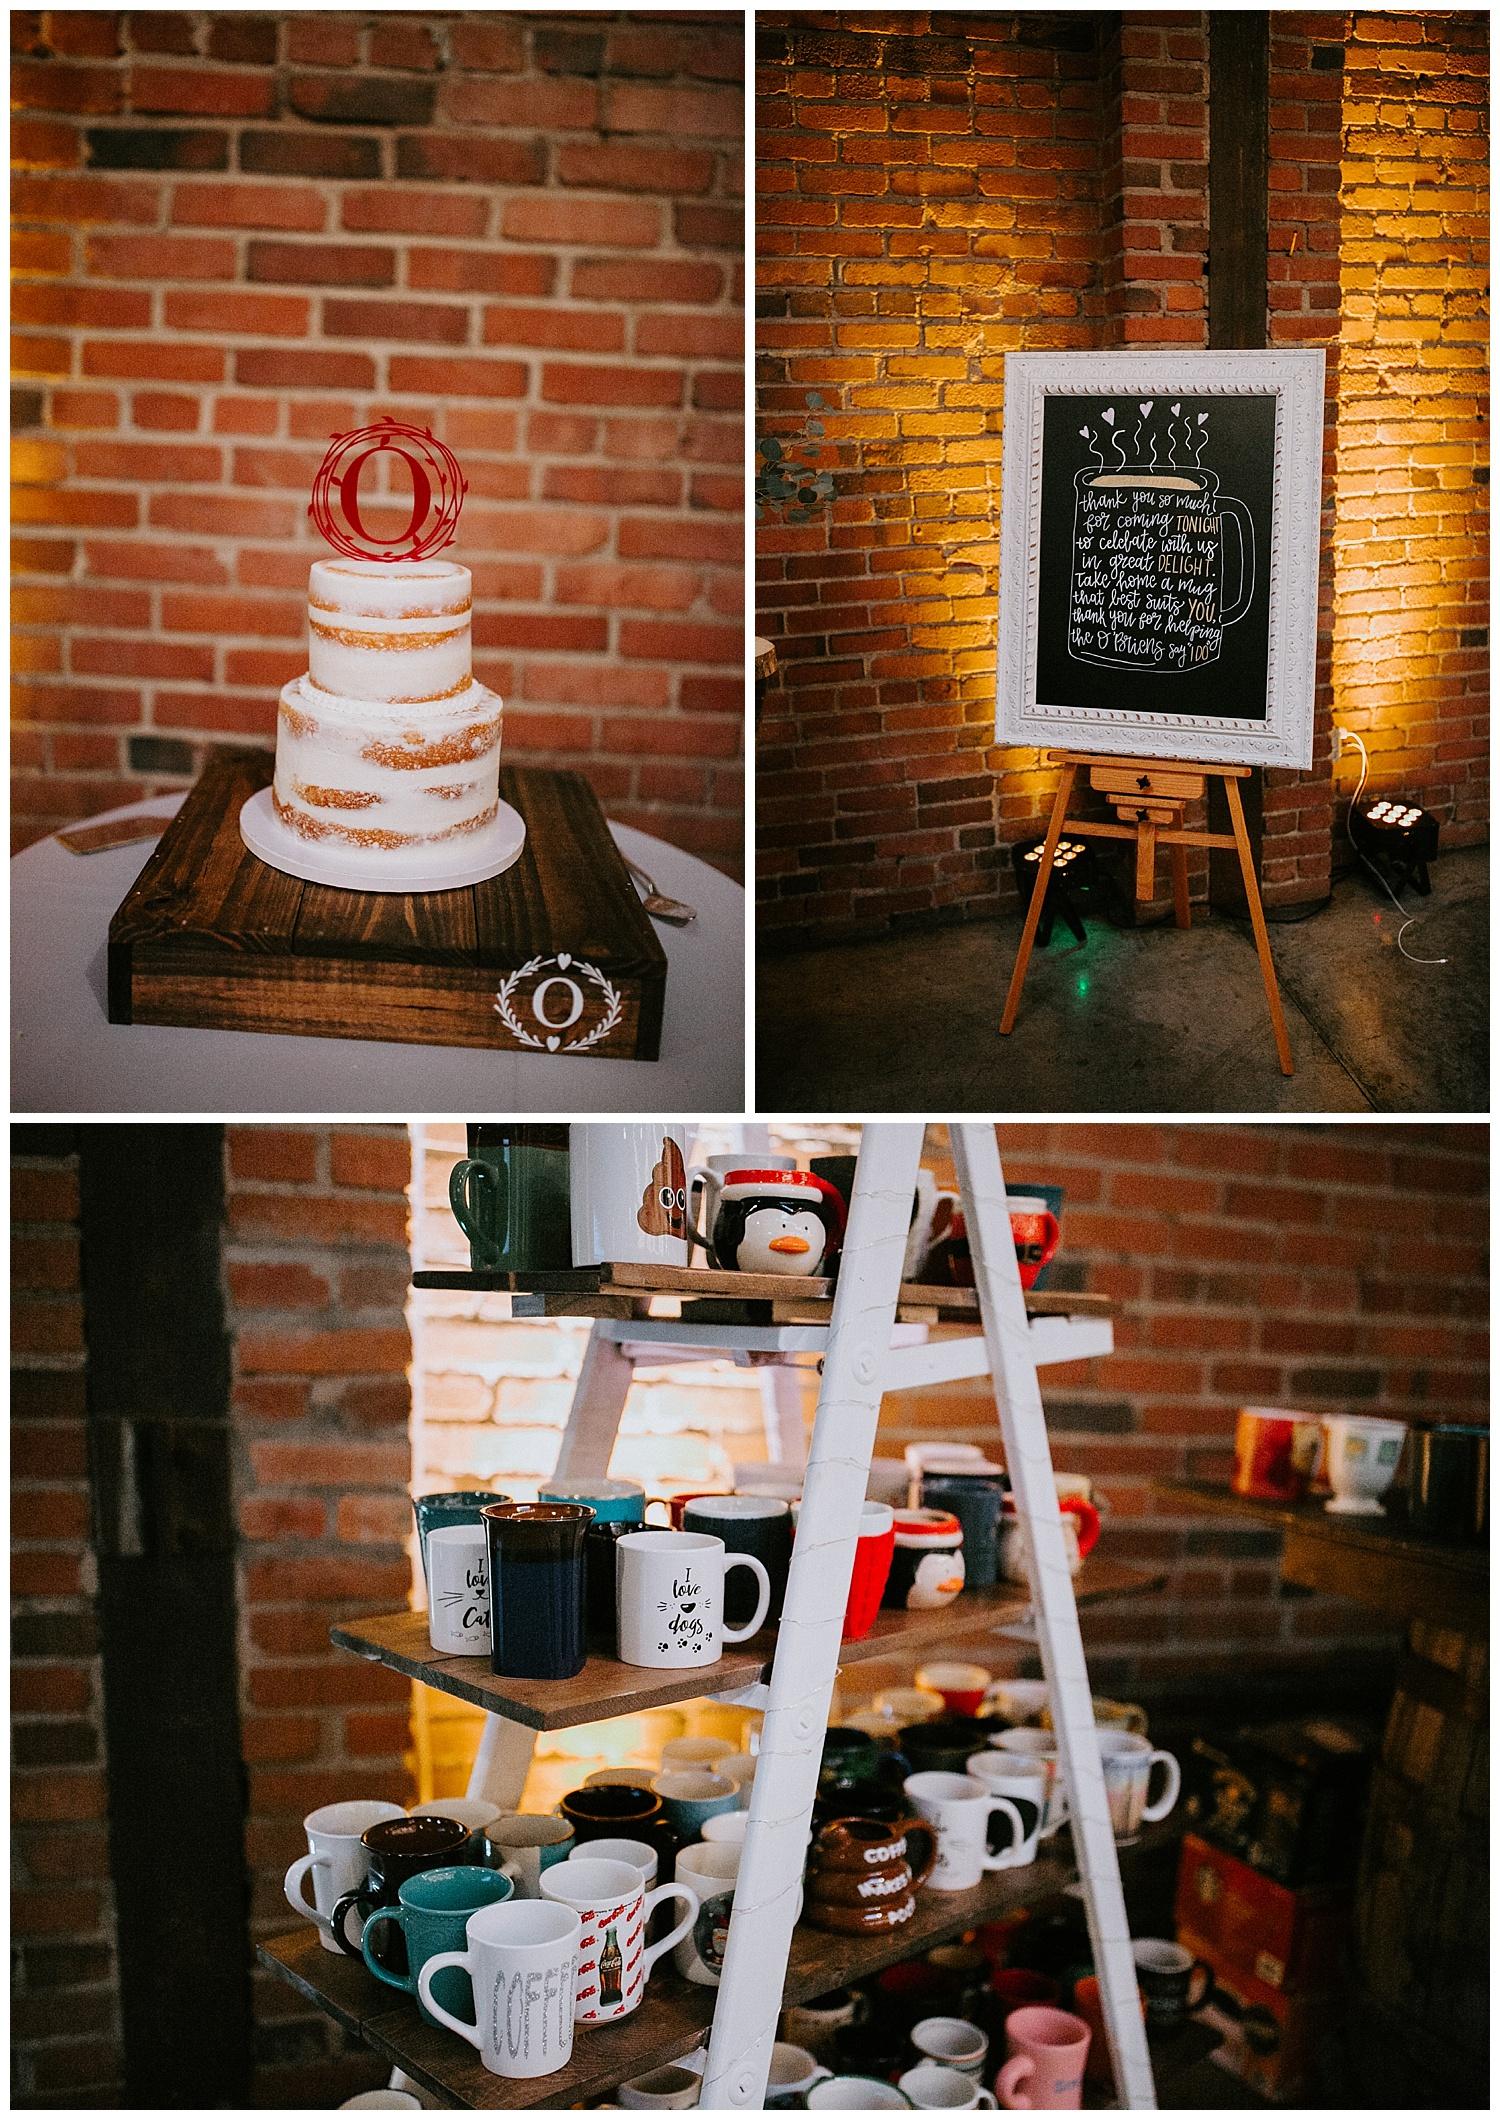 winter-wedding-the standard-knoxville_2019-01-23_0076.jpg